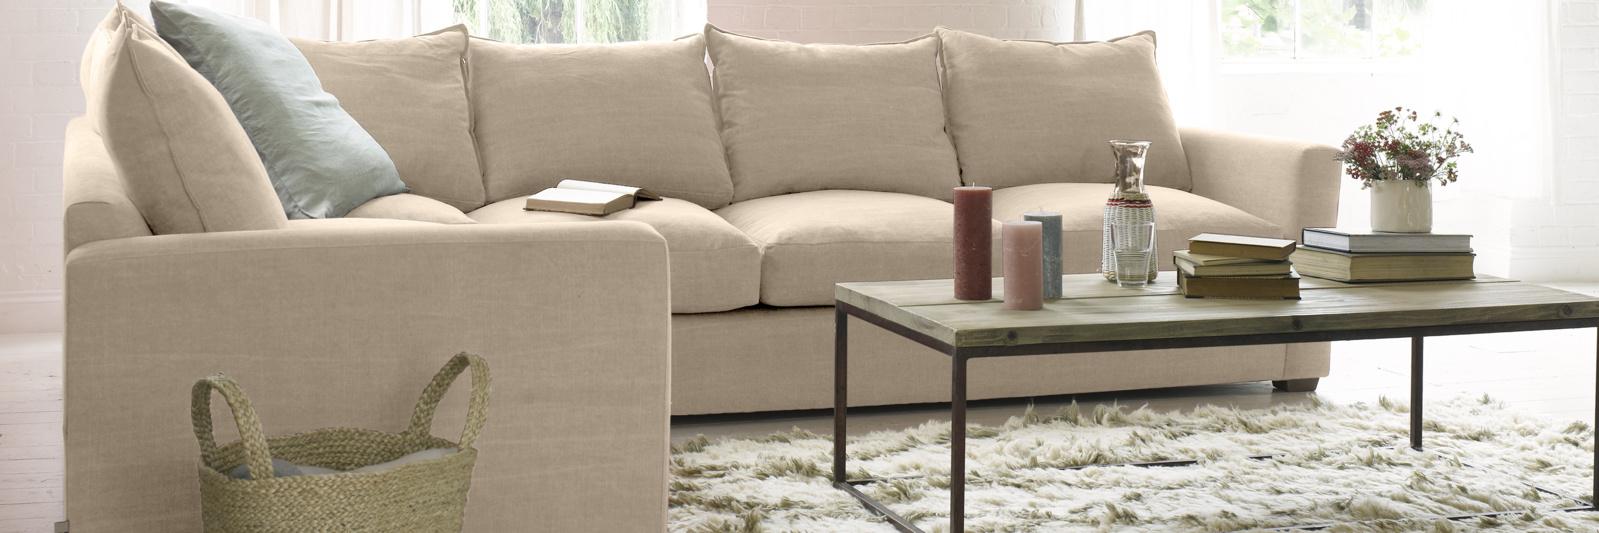 Pavilion corner sofa in neutral fabric